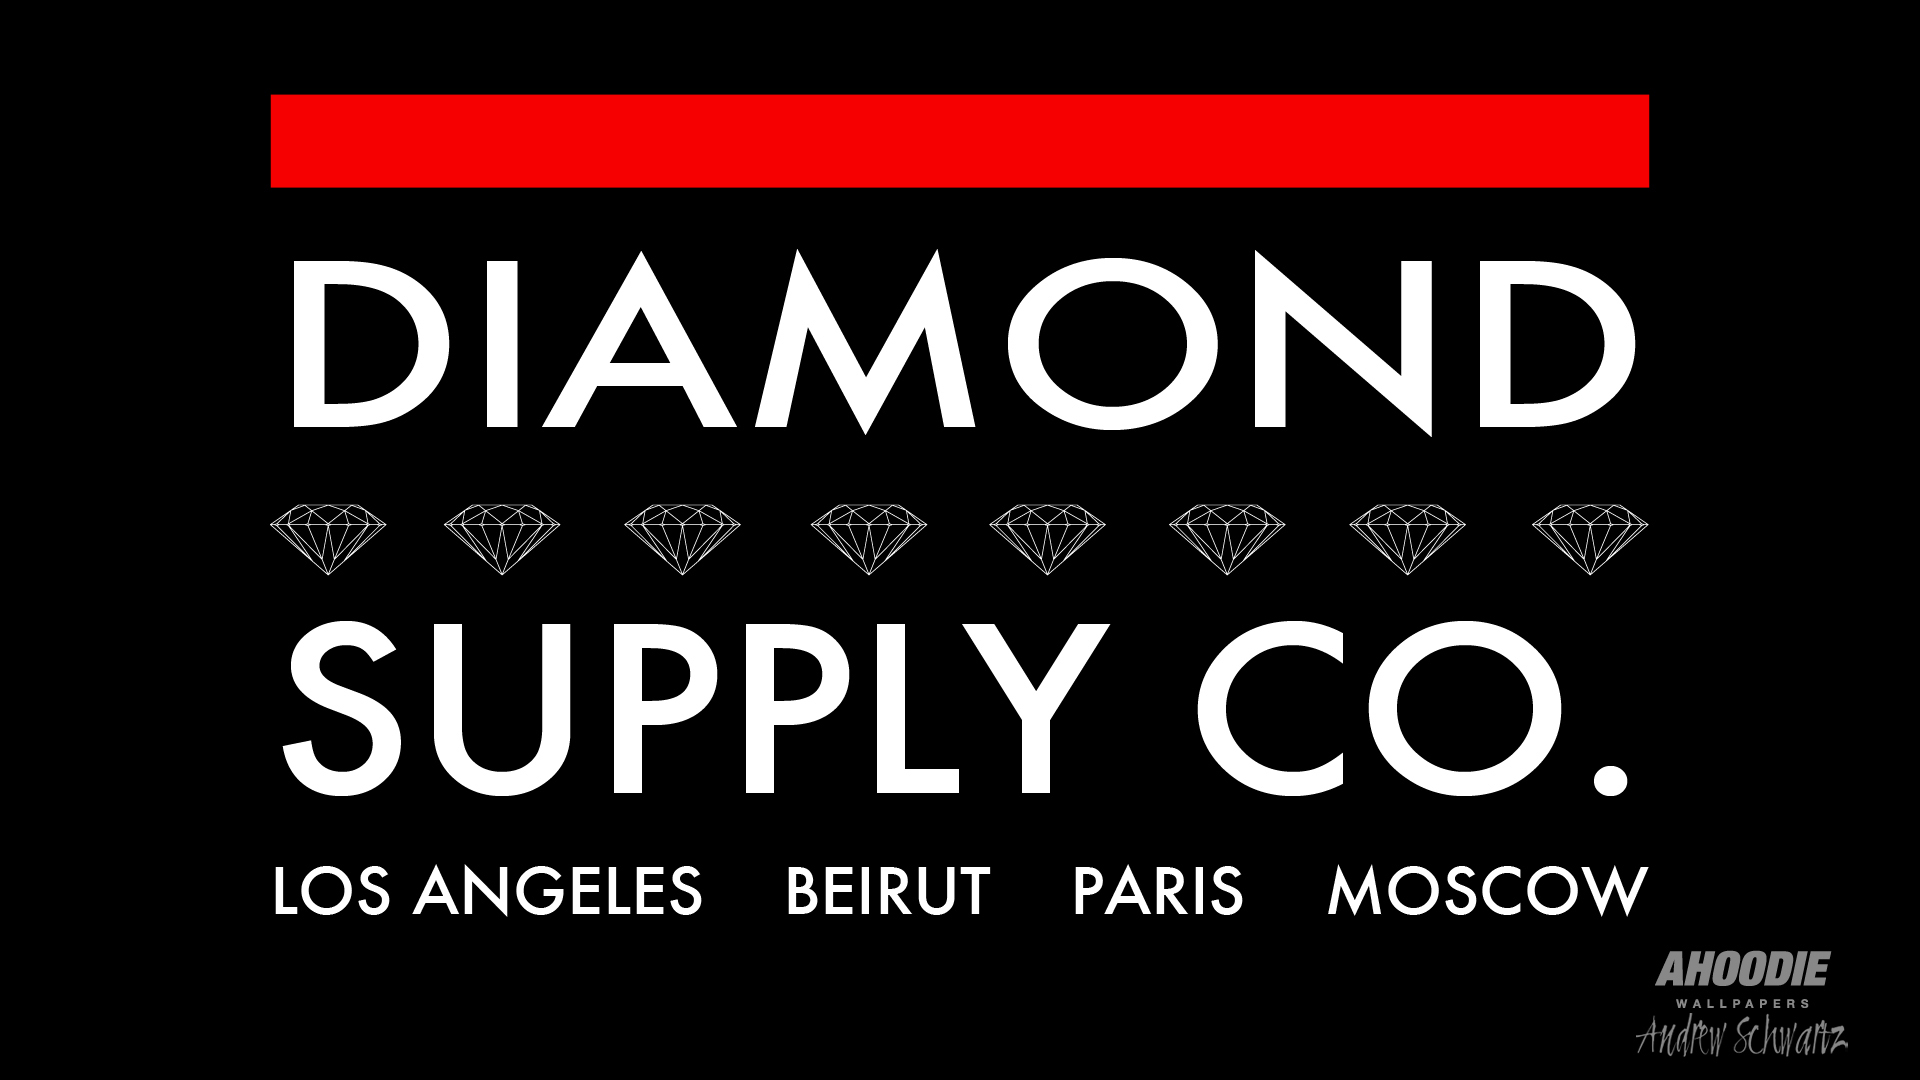 Diamond Supply Co Wallpaper HD 1920x1080